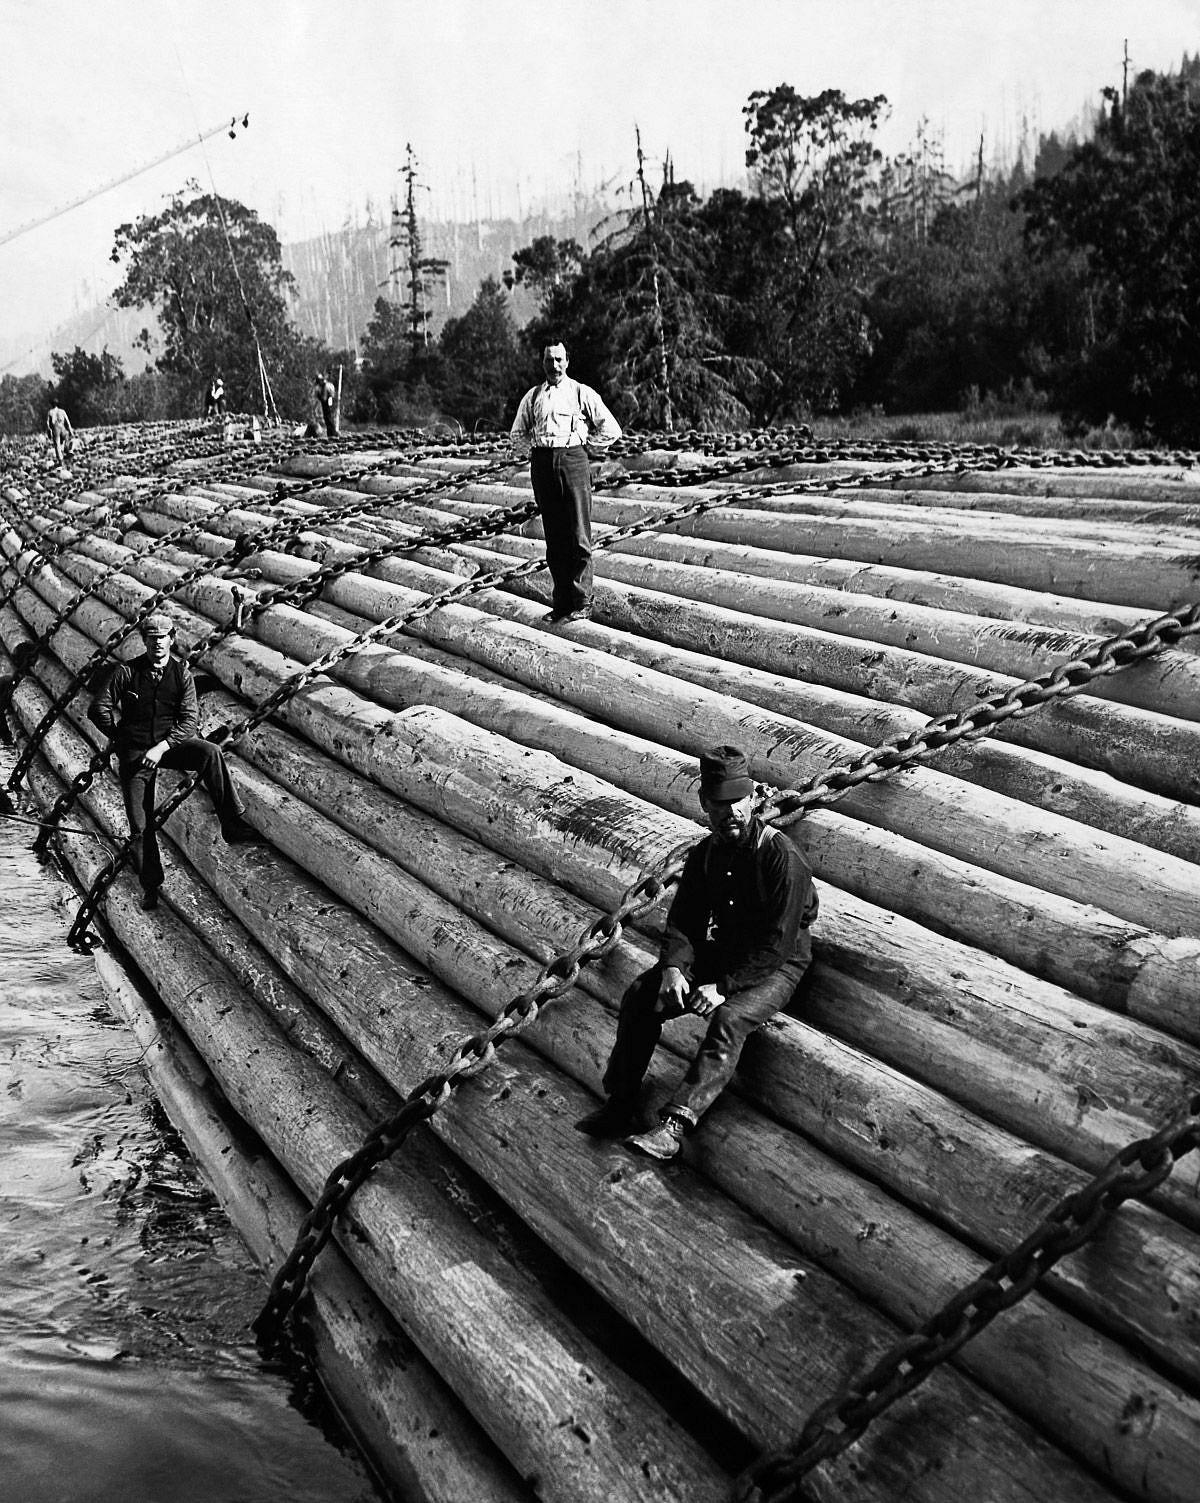 c. 1910  Lumberjacks float lumber down the Columbia River in Oregon.  Image: Underwood & Underwood/Corbis